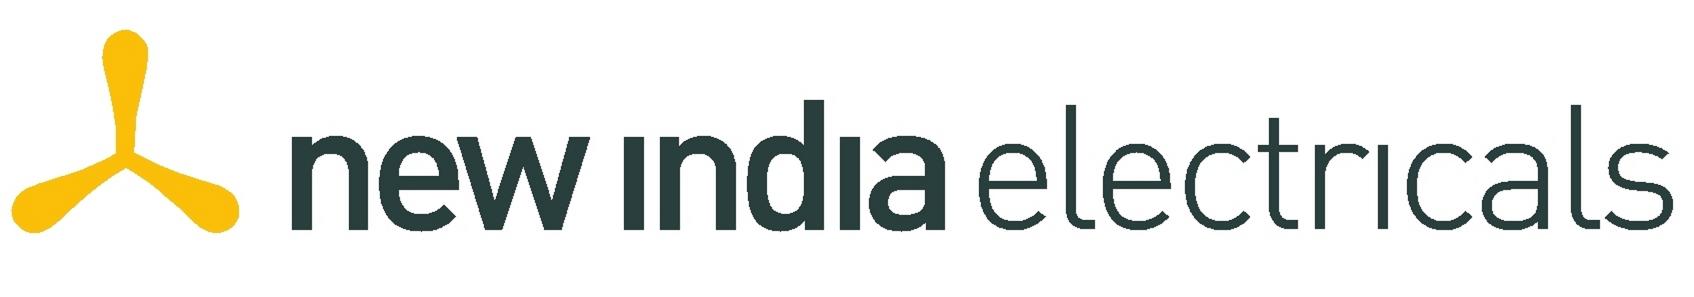 NEW INDIA ELECTRICALS LTD.